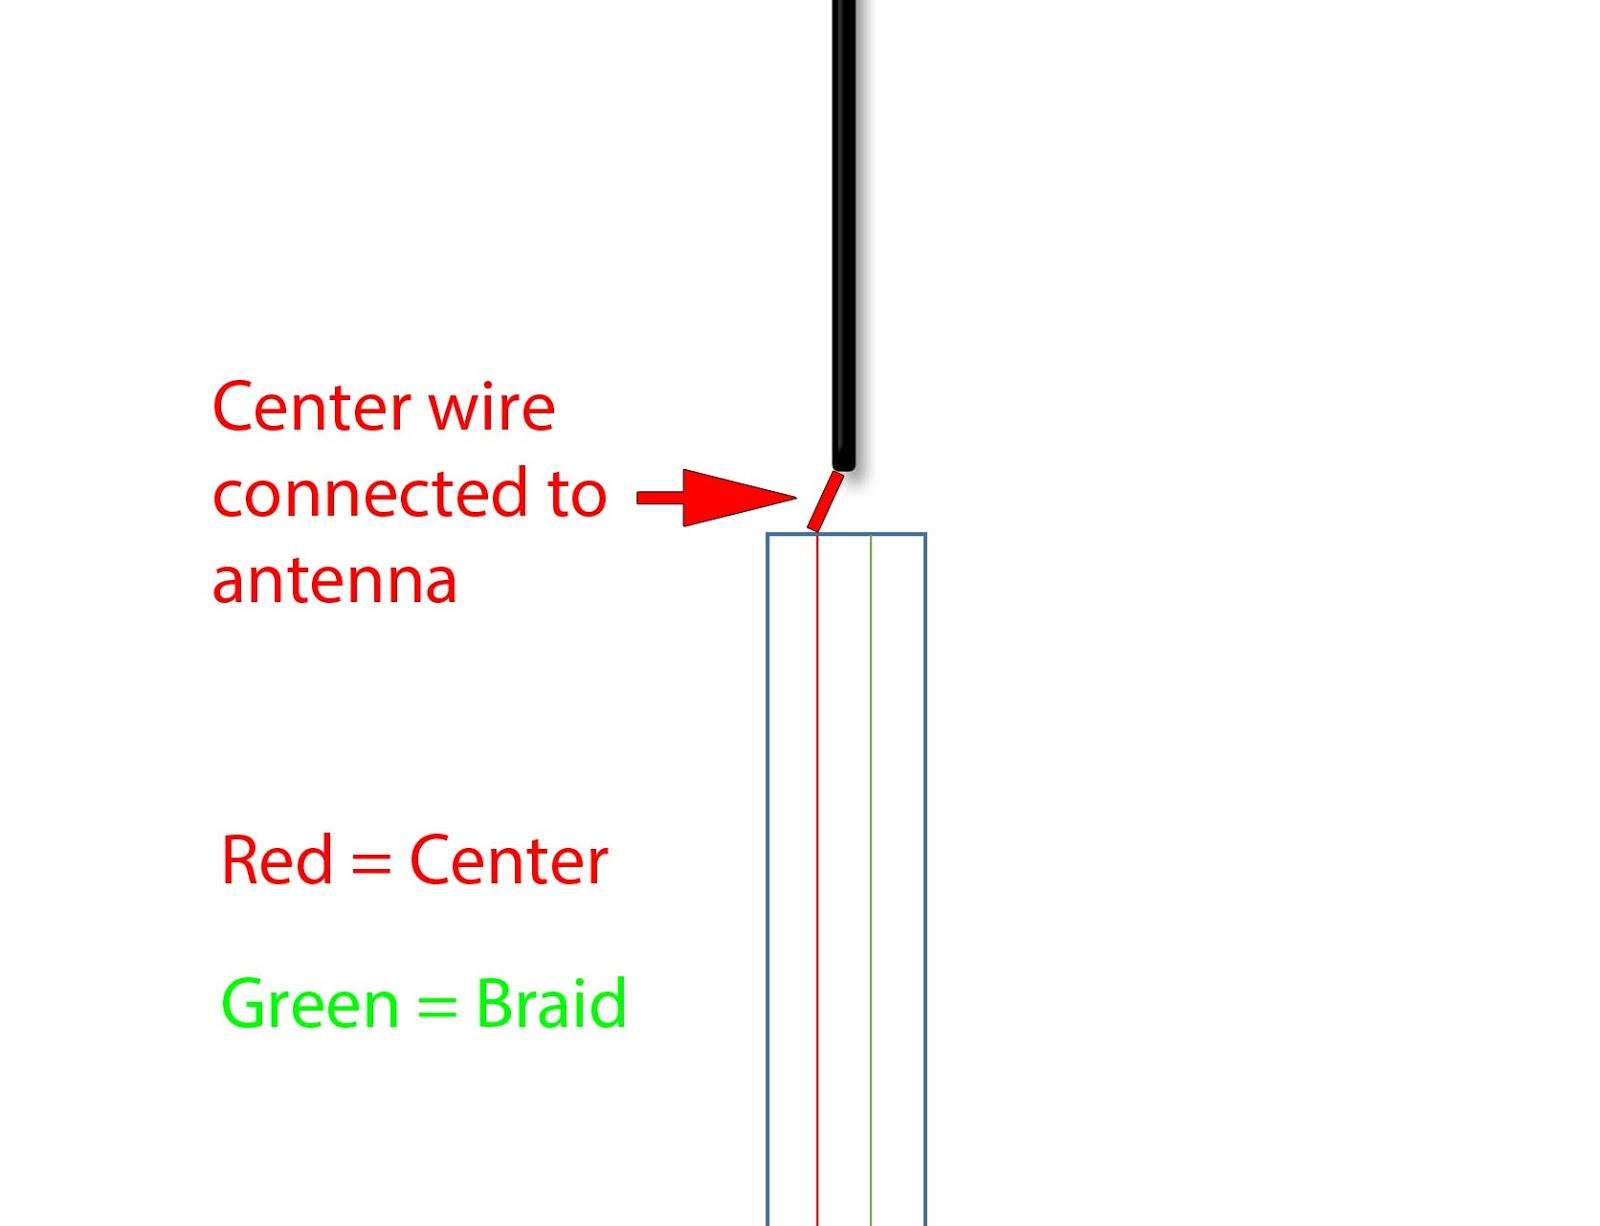 Vhf Antenna Wiring Diagram | Wiring Liry on microphone wiring diagram, charger wiring diagram, speaker wiring diagram, radio wiring diagram, power supply wiring diagram, battery wiring diagram, control box wiring diagram, cctv wiring diagram, usb cable wiring diagram, lowrance gps wiring diagram, switch wiring diagram, coaxial cable wiring diagram, pump wiring diagram, starter wiring diagram, standard horizon wiring diagram, network cable wiring diagram, horn wiring diagram, pc wiring diagram, instrument wiring diagram, lights wiring diagram,